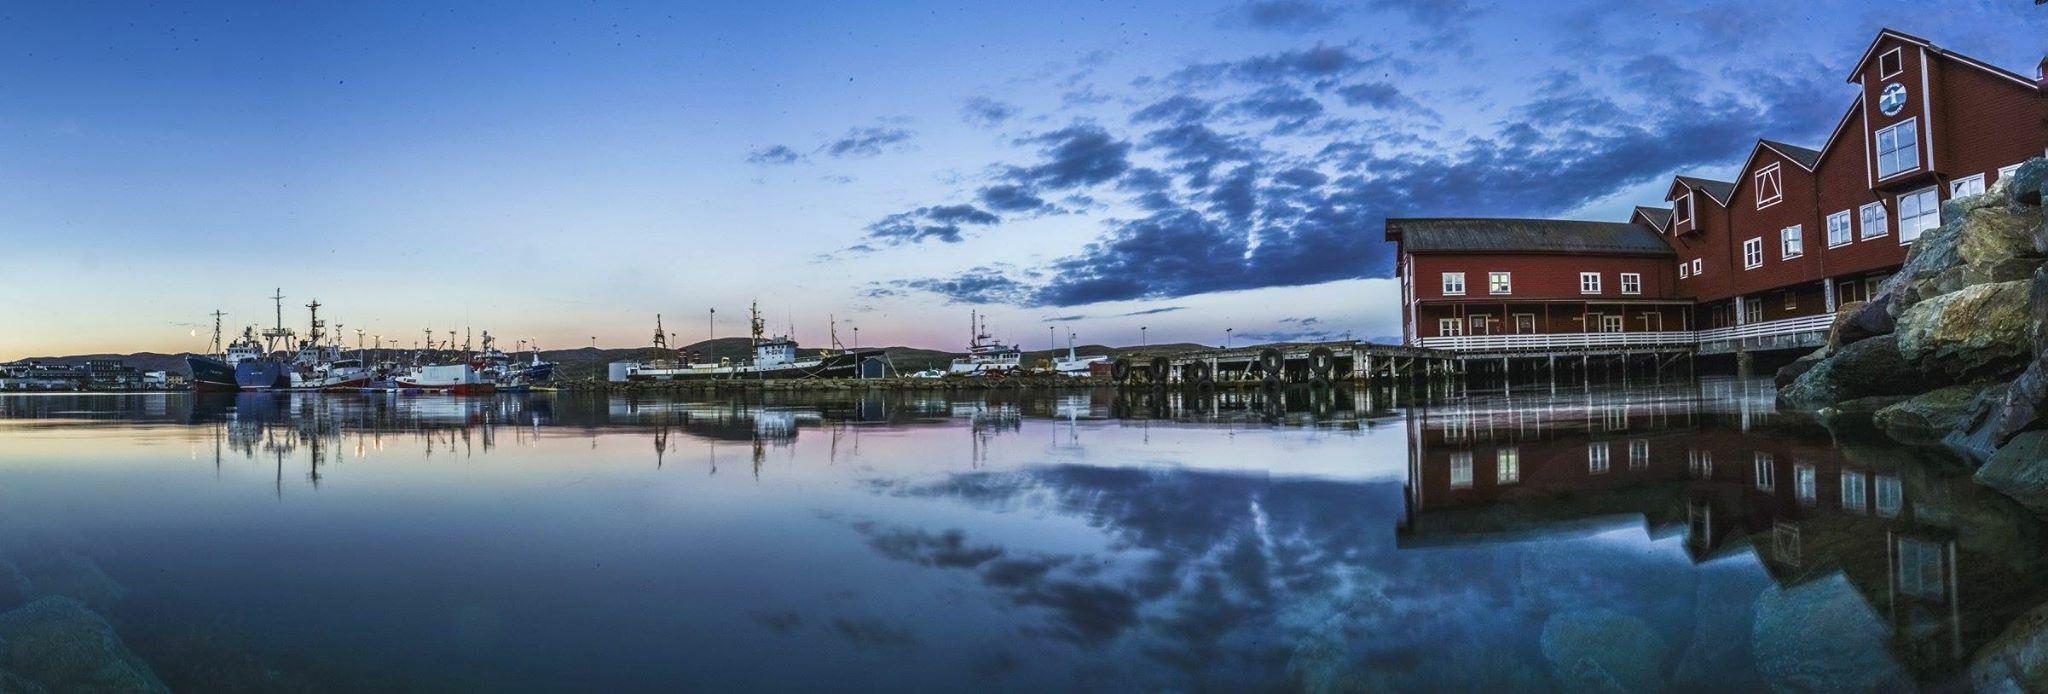 Båtsfjord Brygge - rorbuer